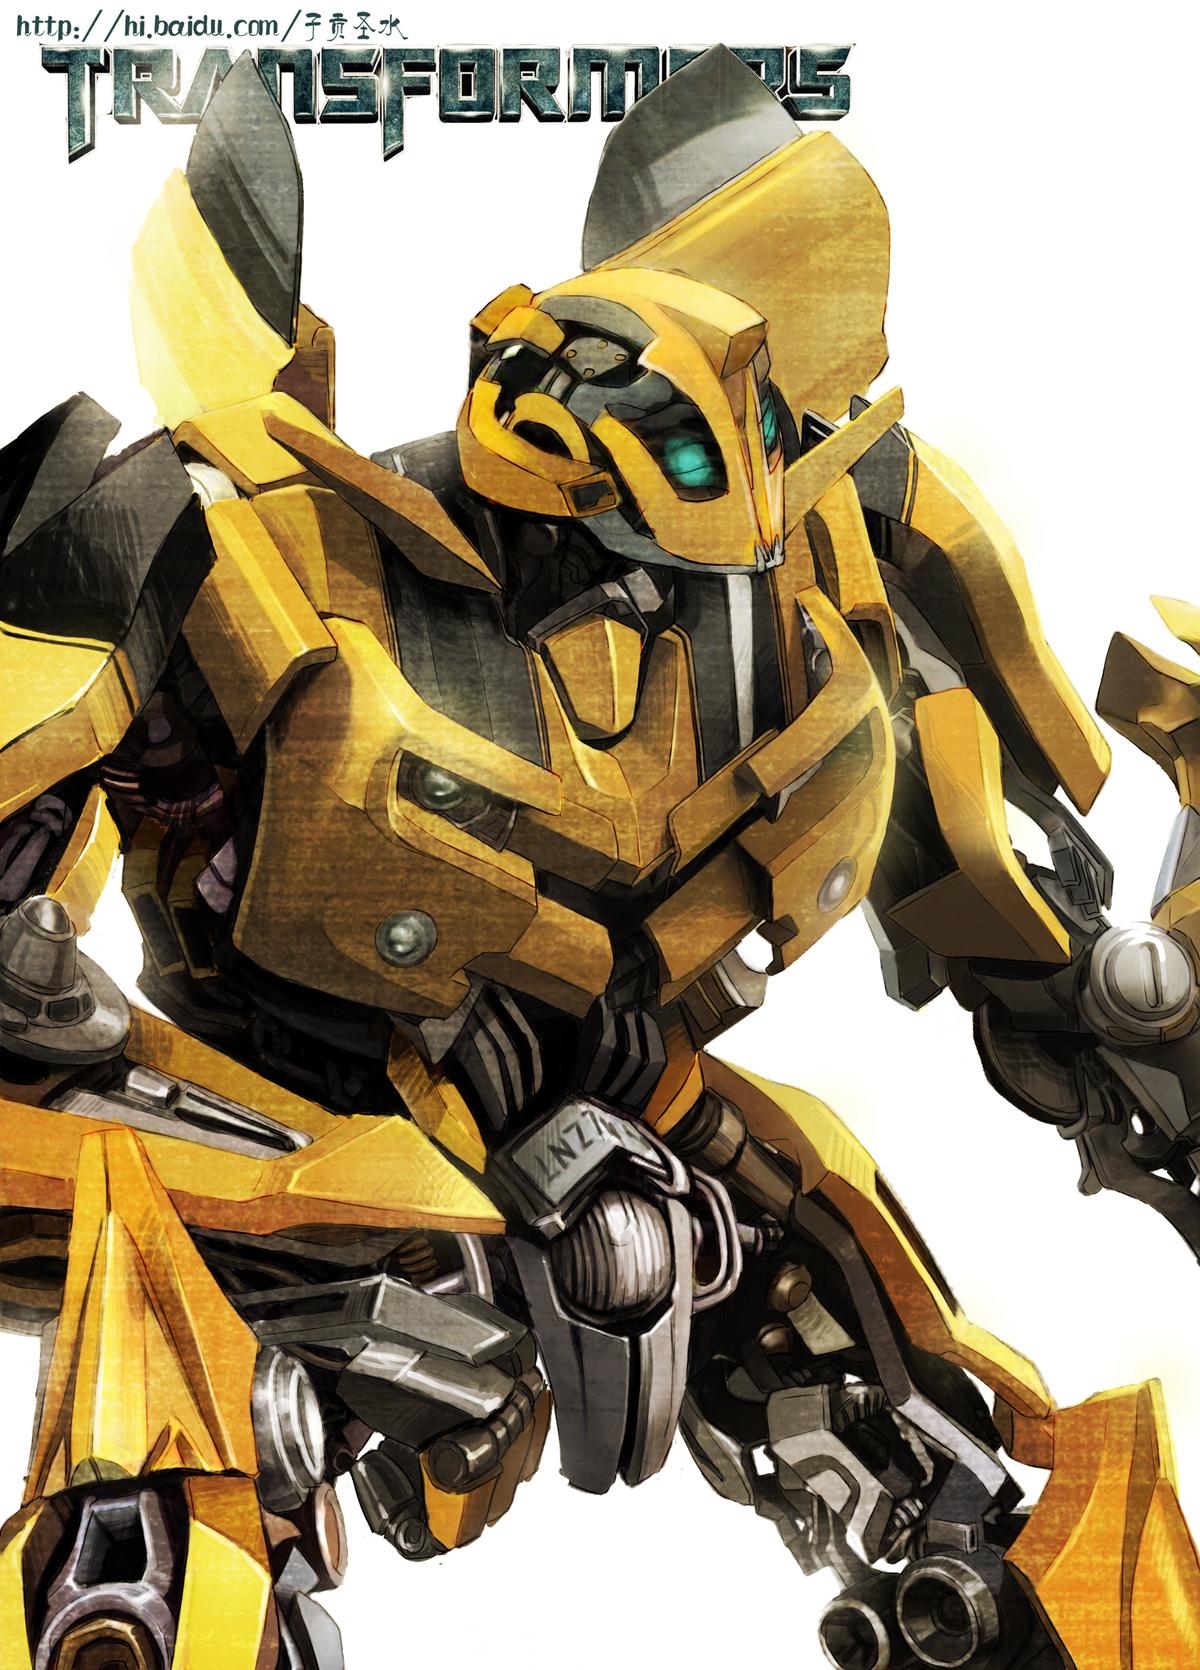 Bumblebee - Transformers - Mobile Wallpaper #437066